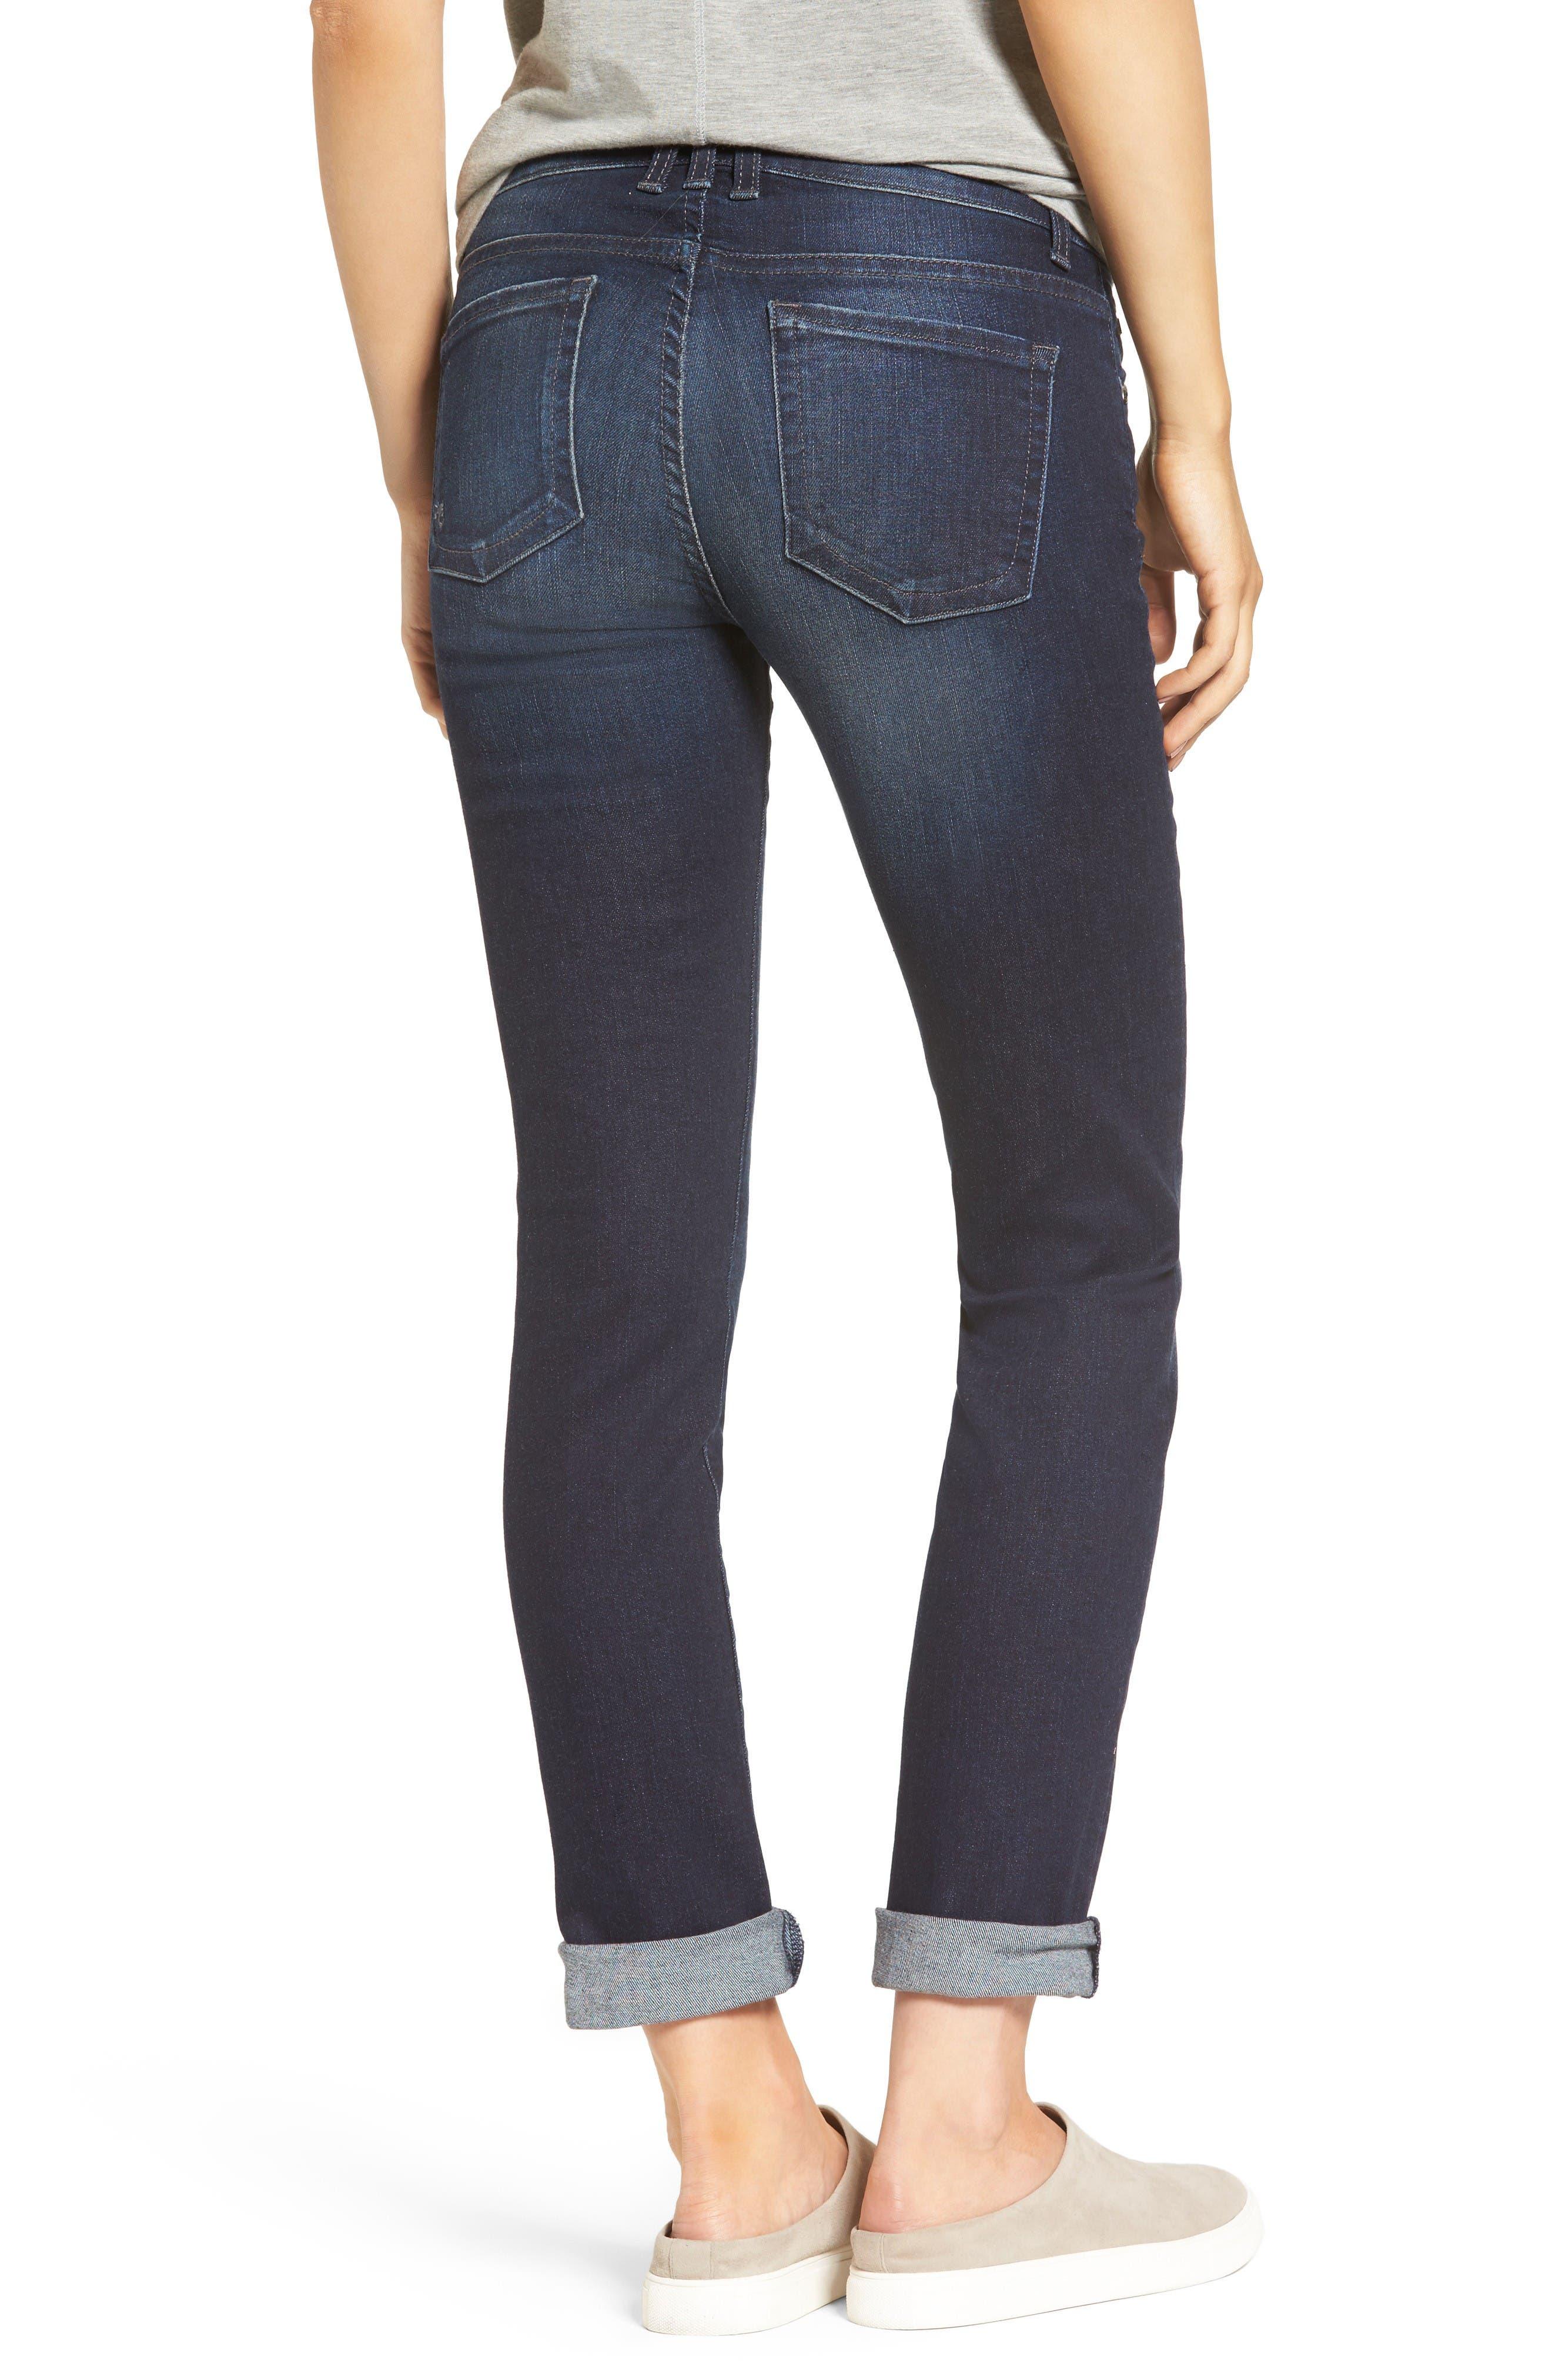 Alternate Image 3  - KUT from the Kloth Catherine Boyfriend Jeans (Regular & Petite) (Vogue)